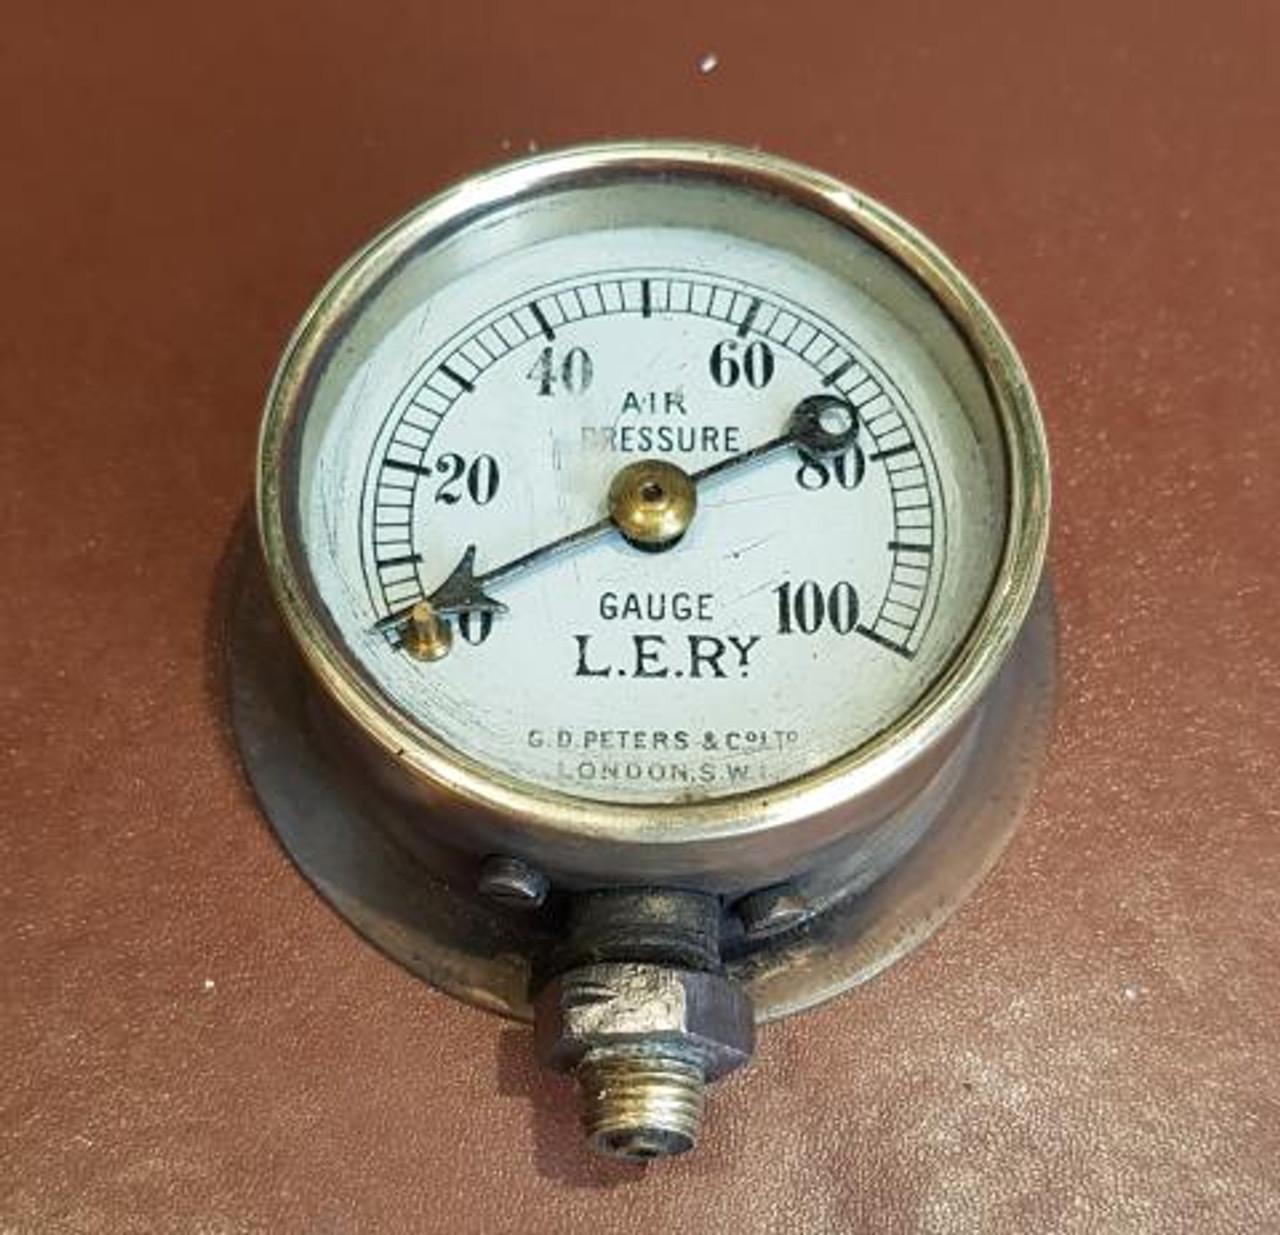 VT 2341 - L.E.R.Y AIR PRESSURE GAUGE